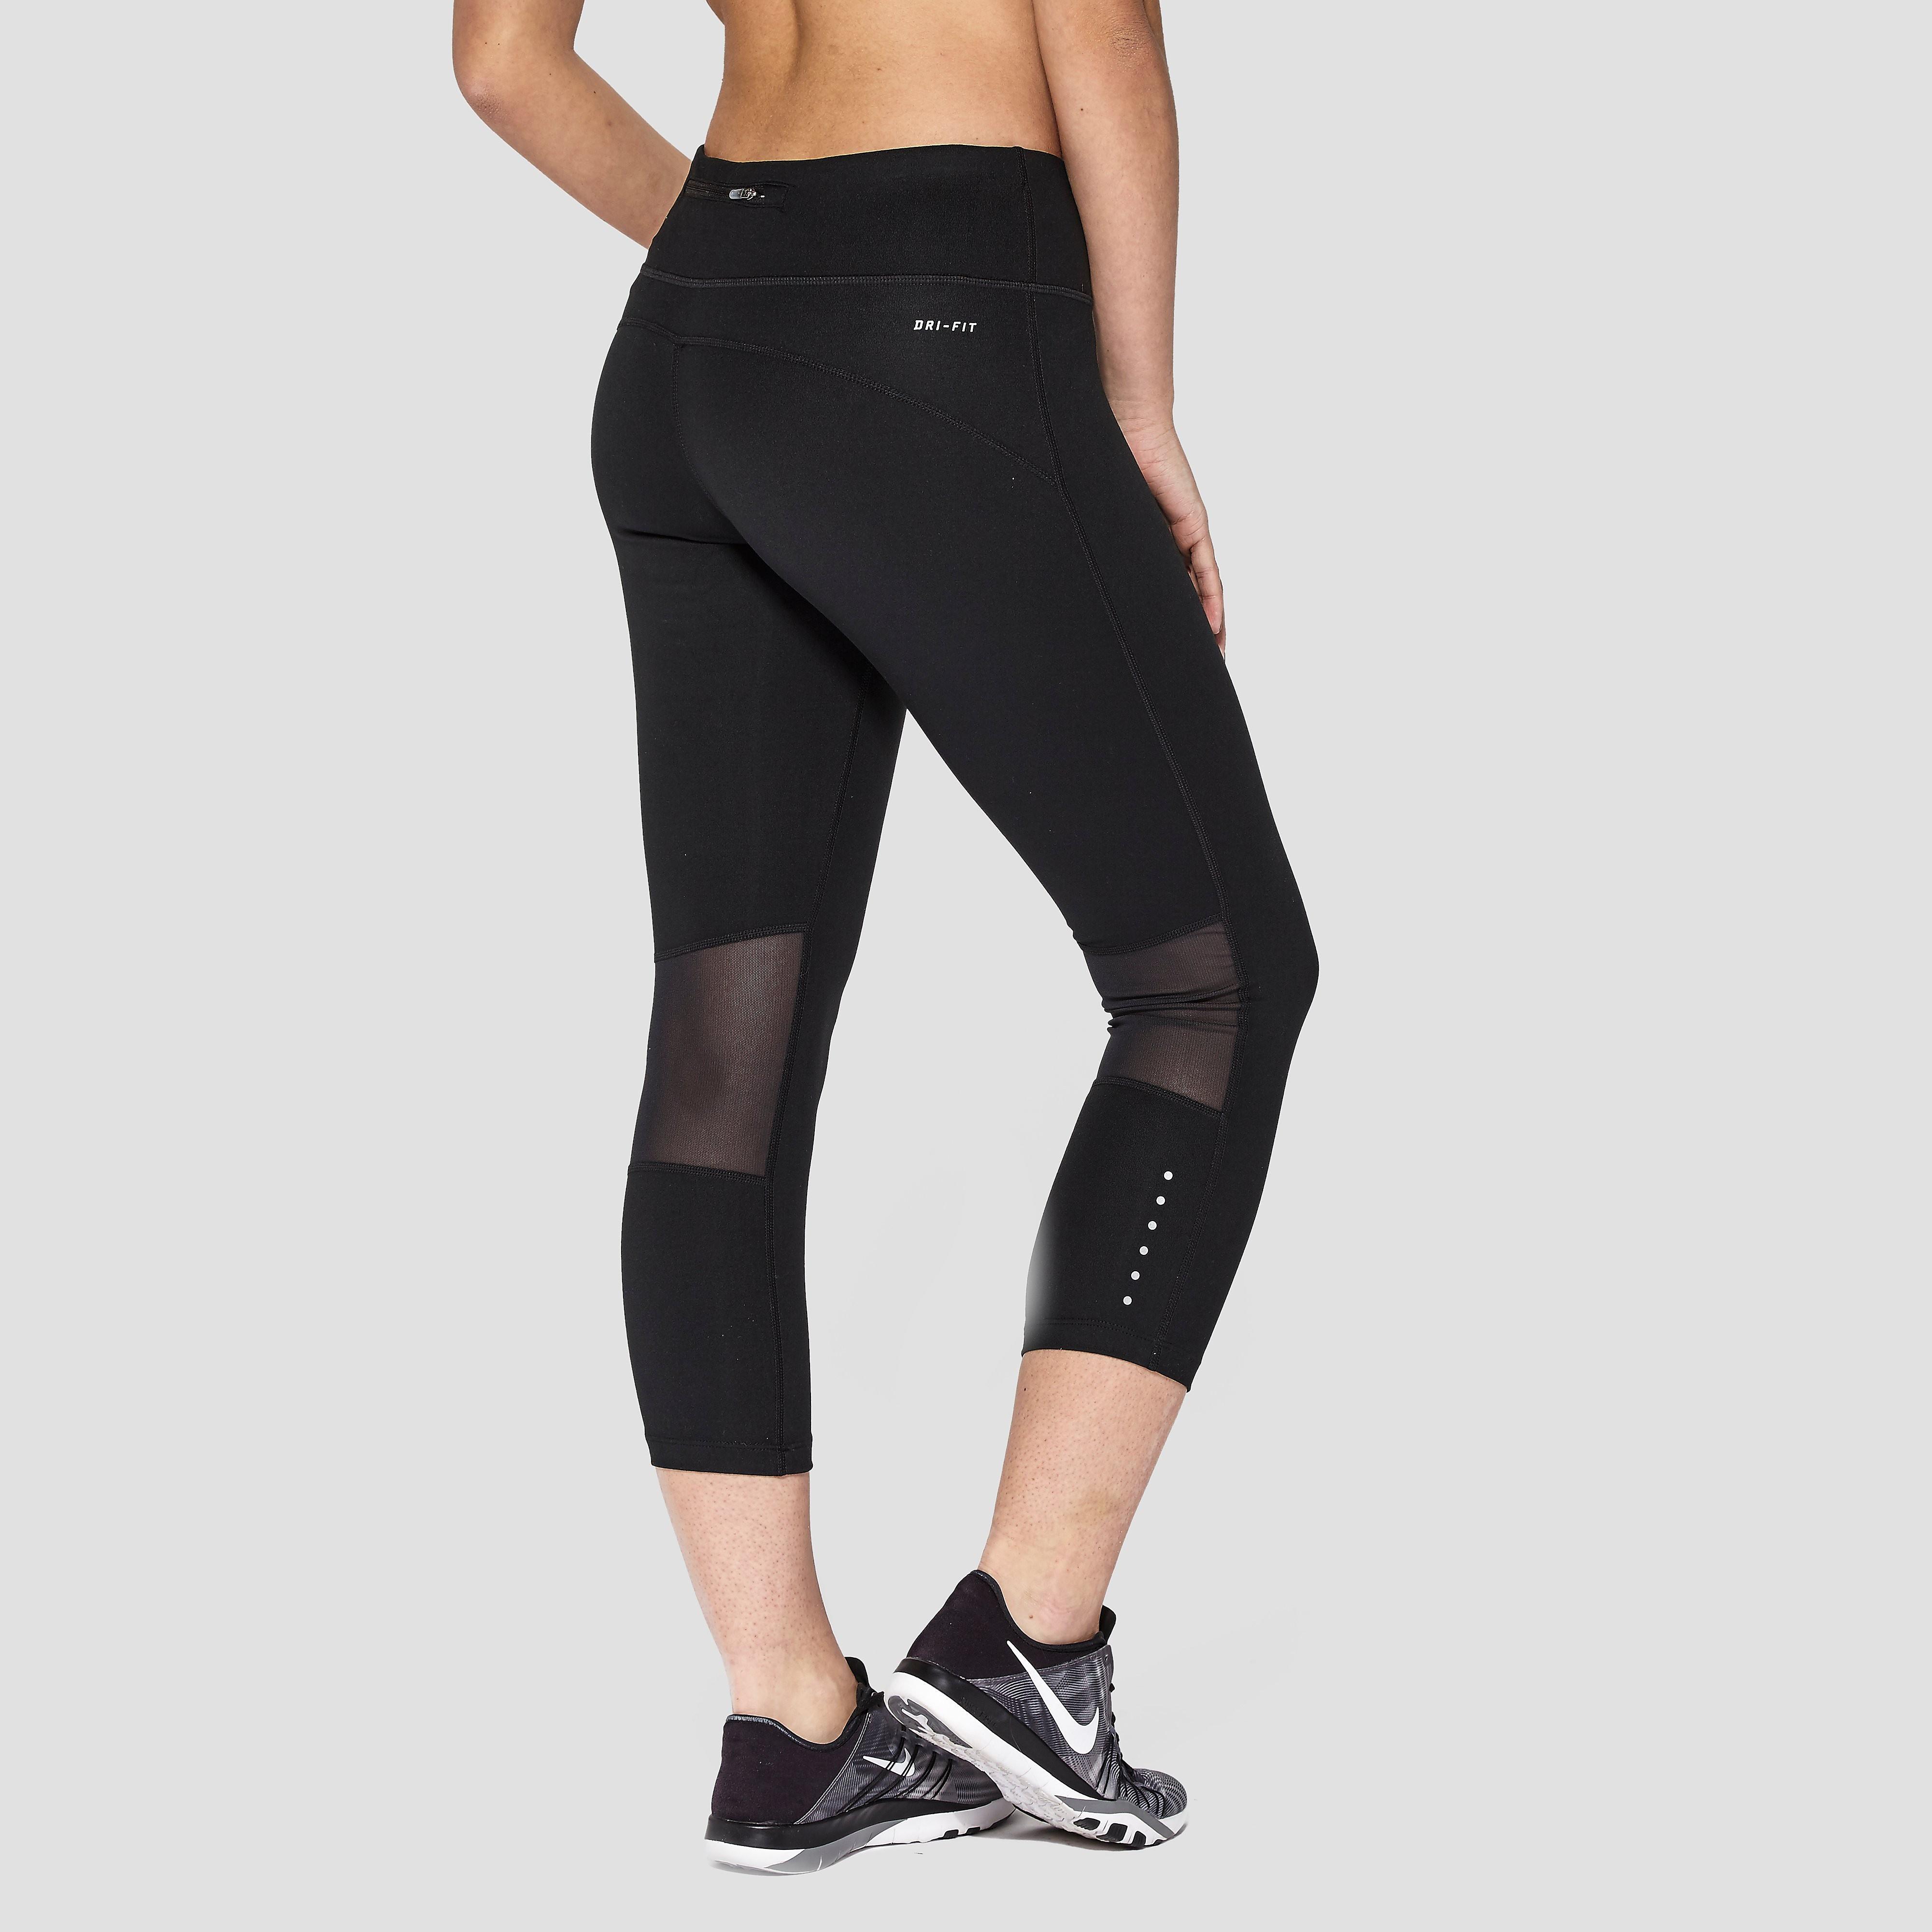 Nike Dri-FIT Epic Run Ladies Running Crops